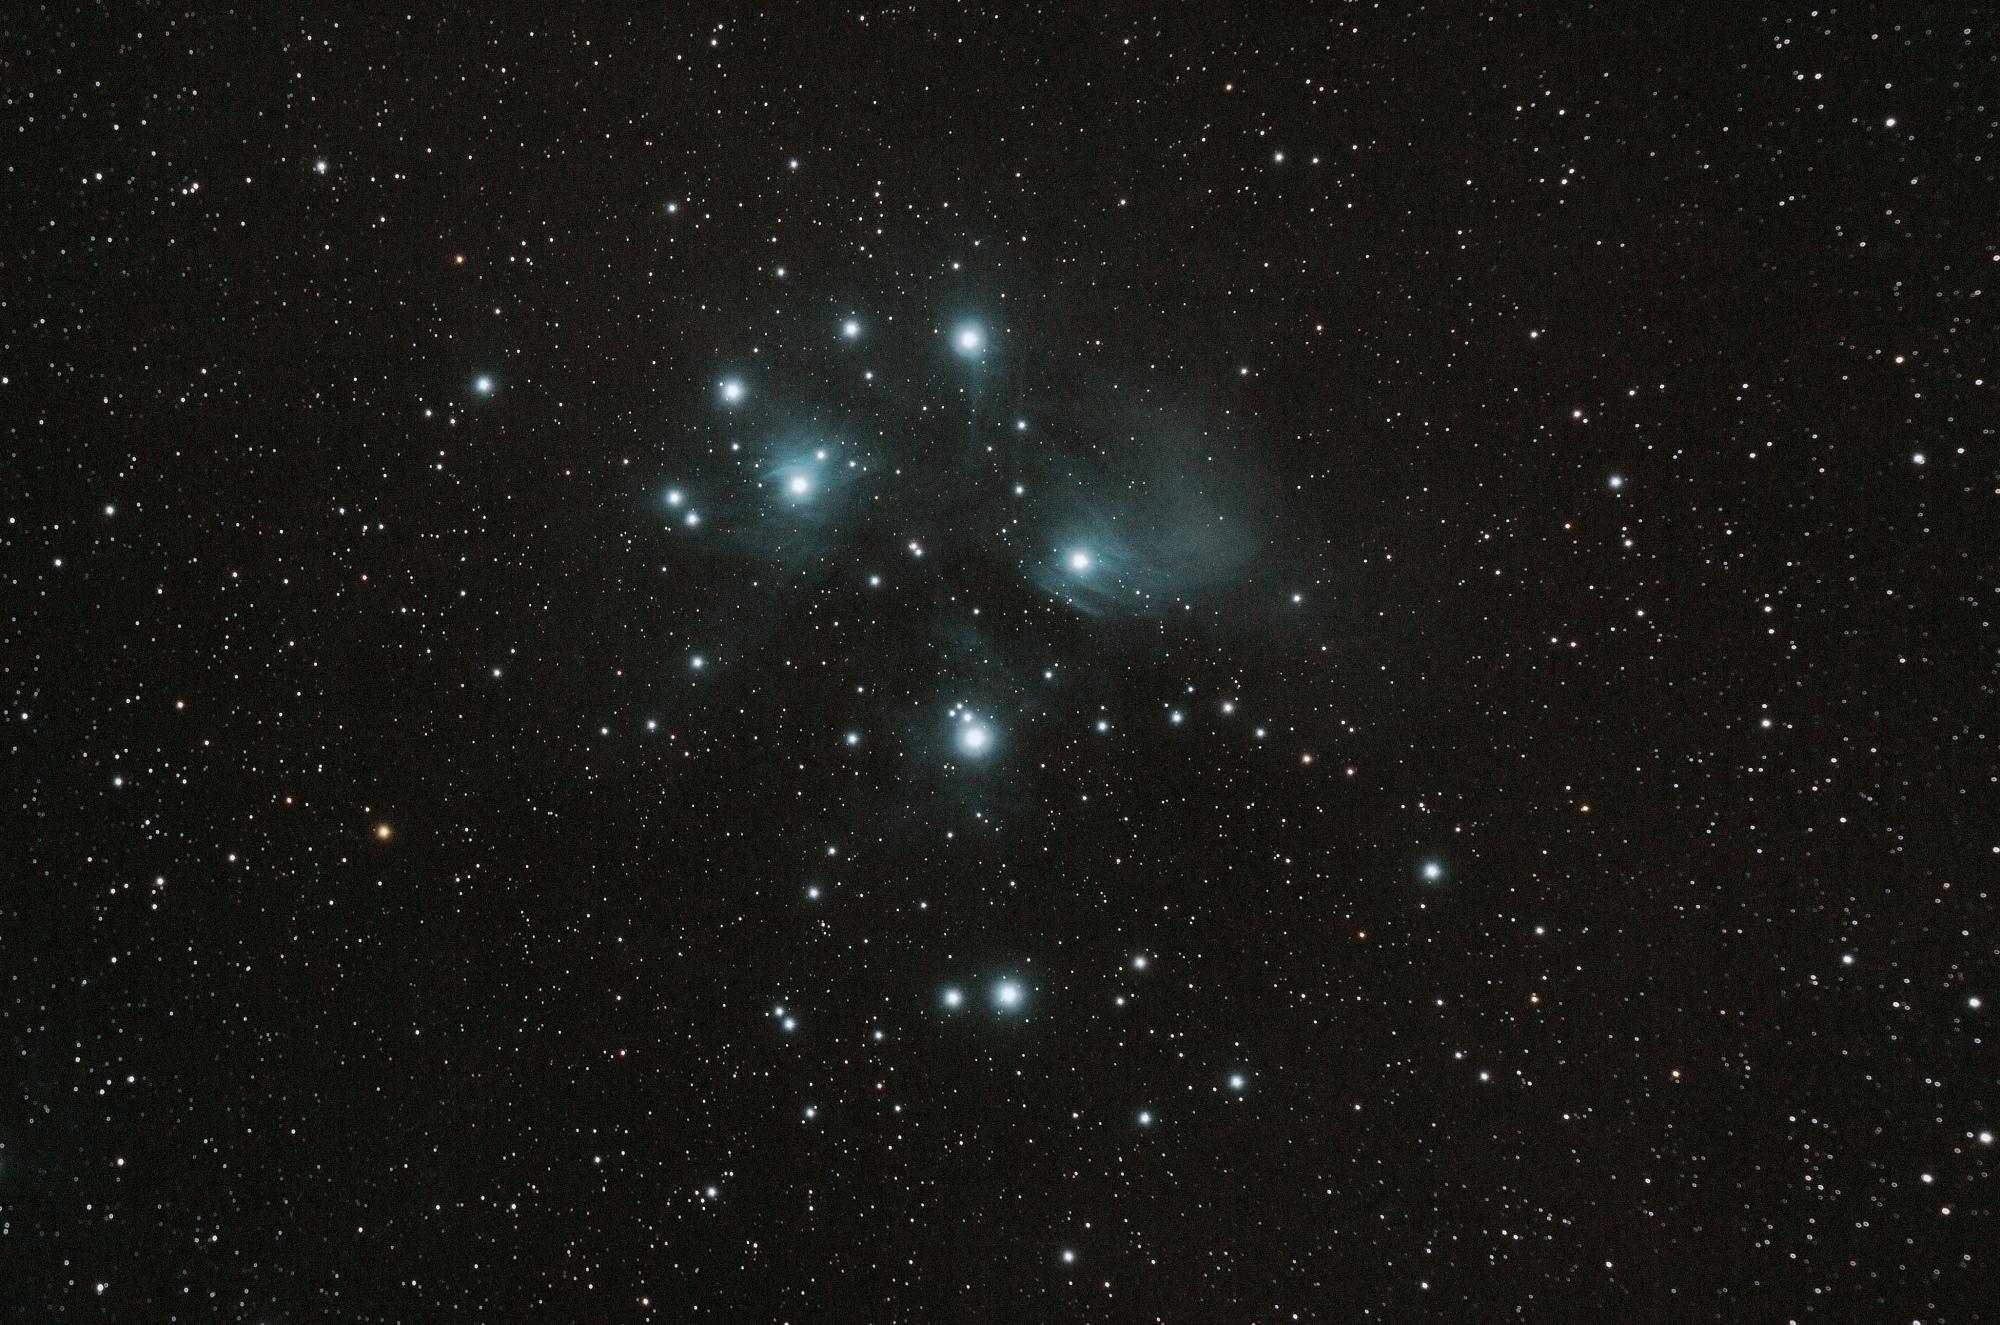 M45_19-10-20.jpg